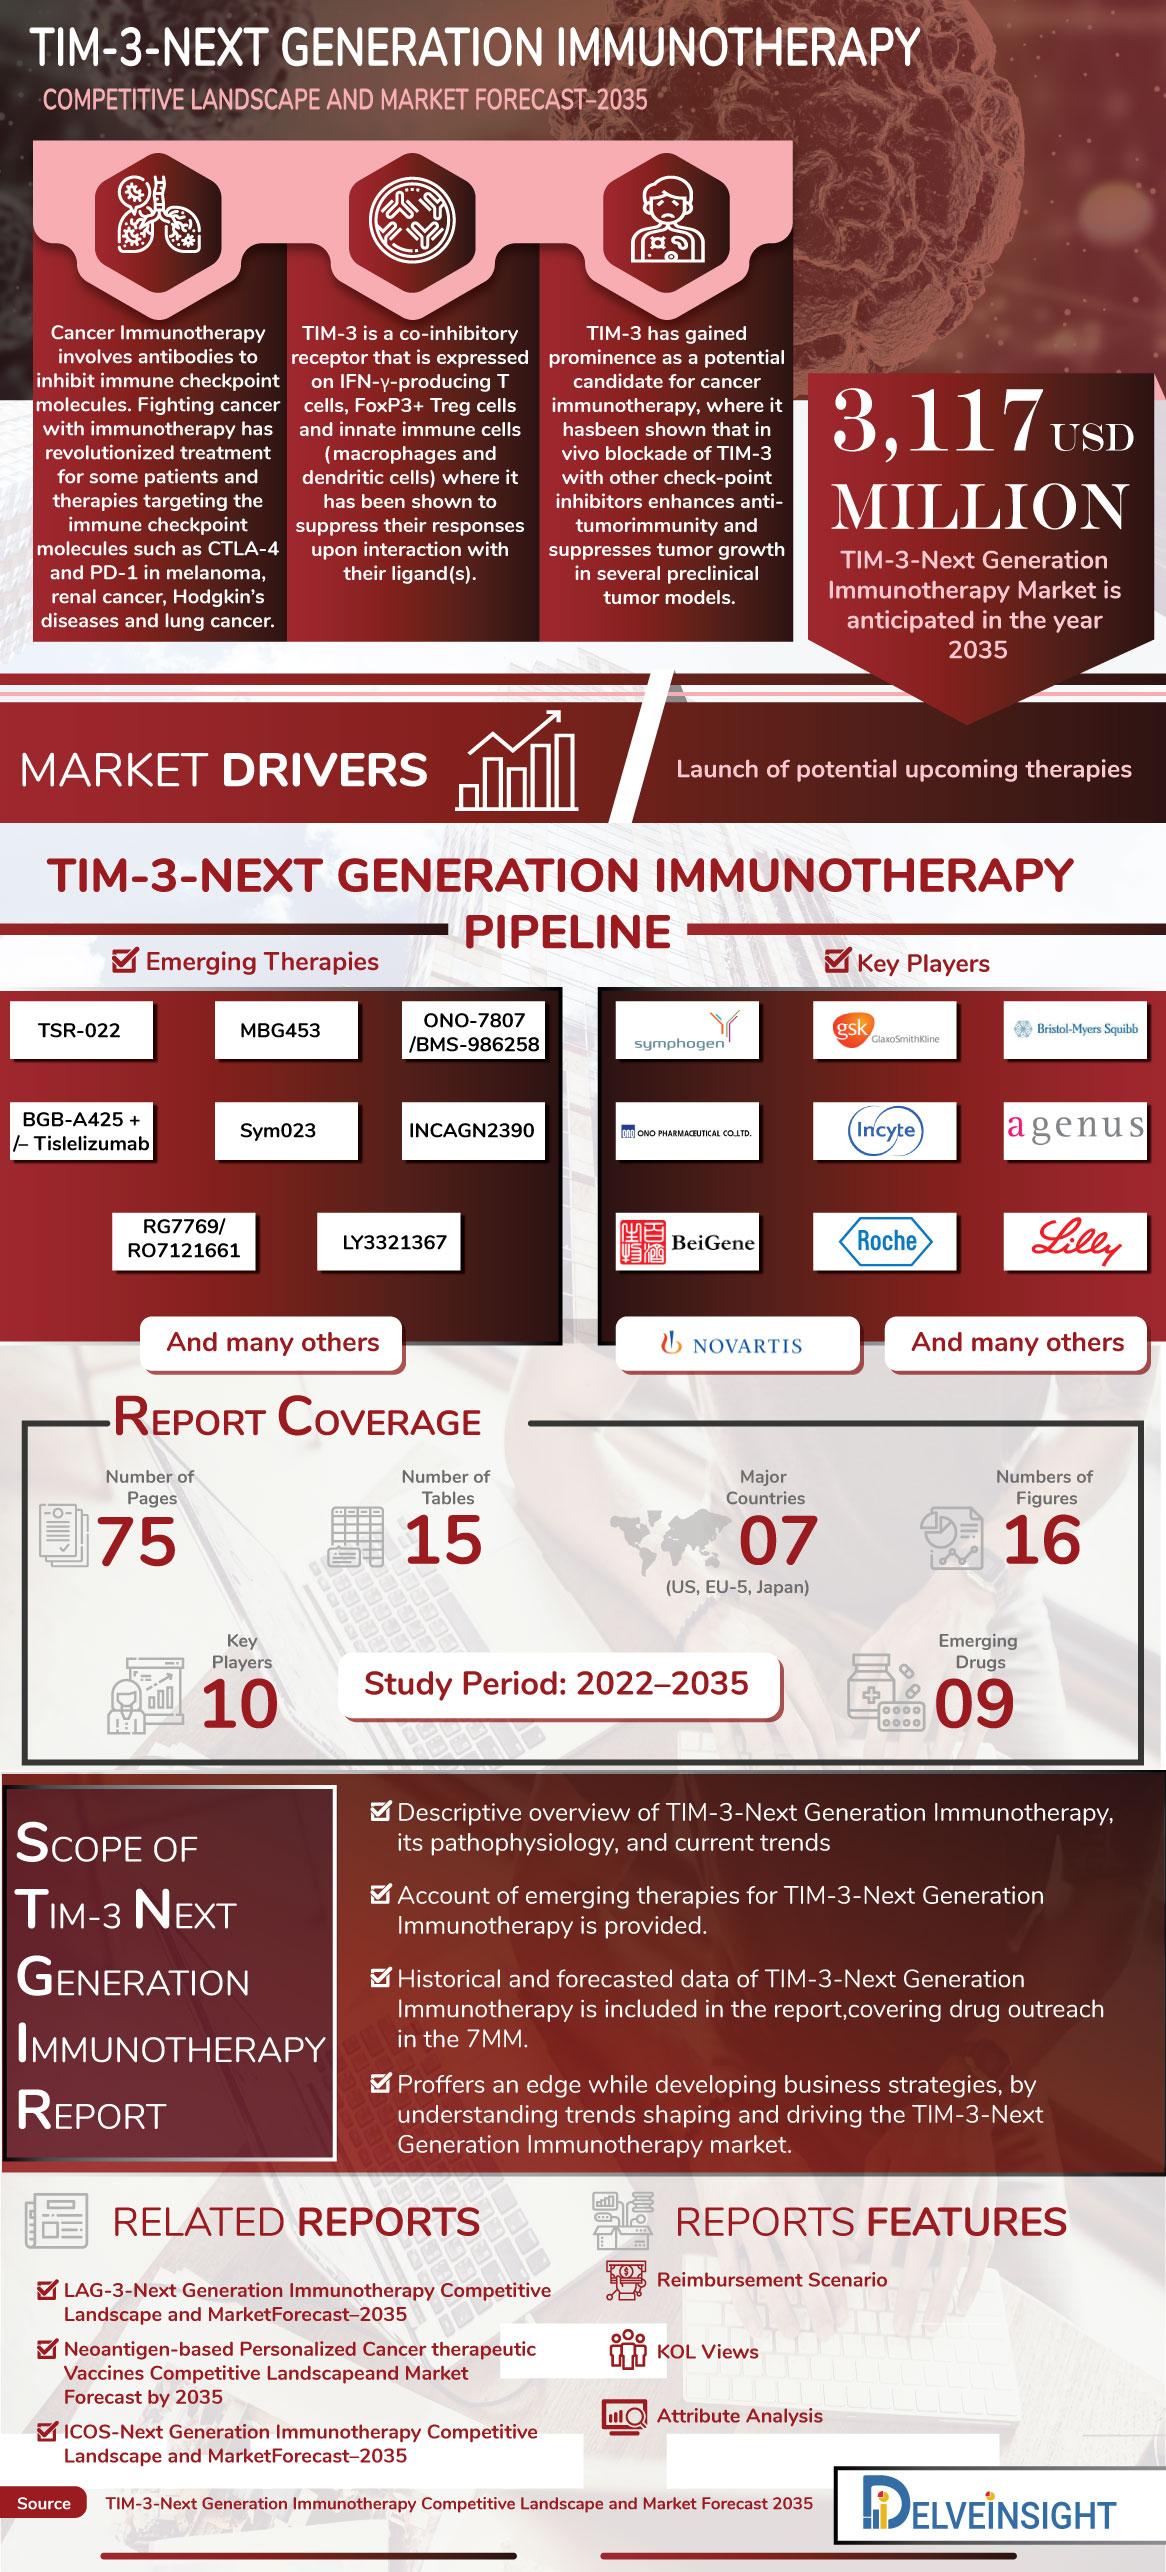 TIM-3-Next Generation Immunotherapy